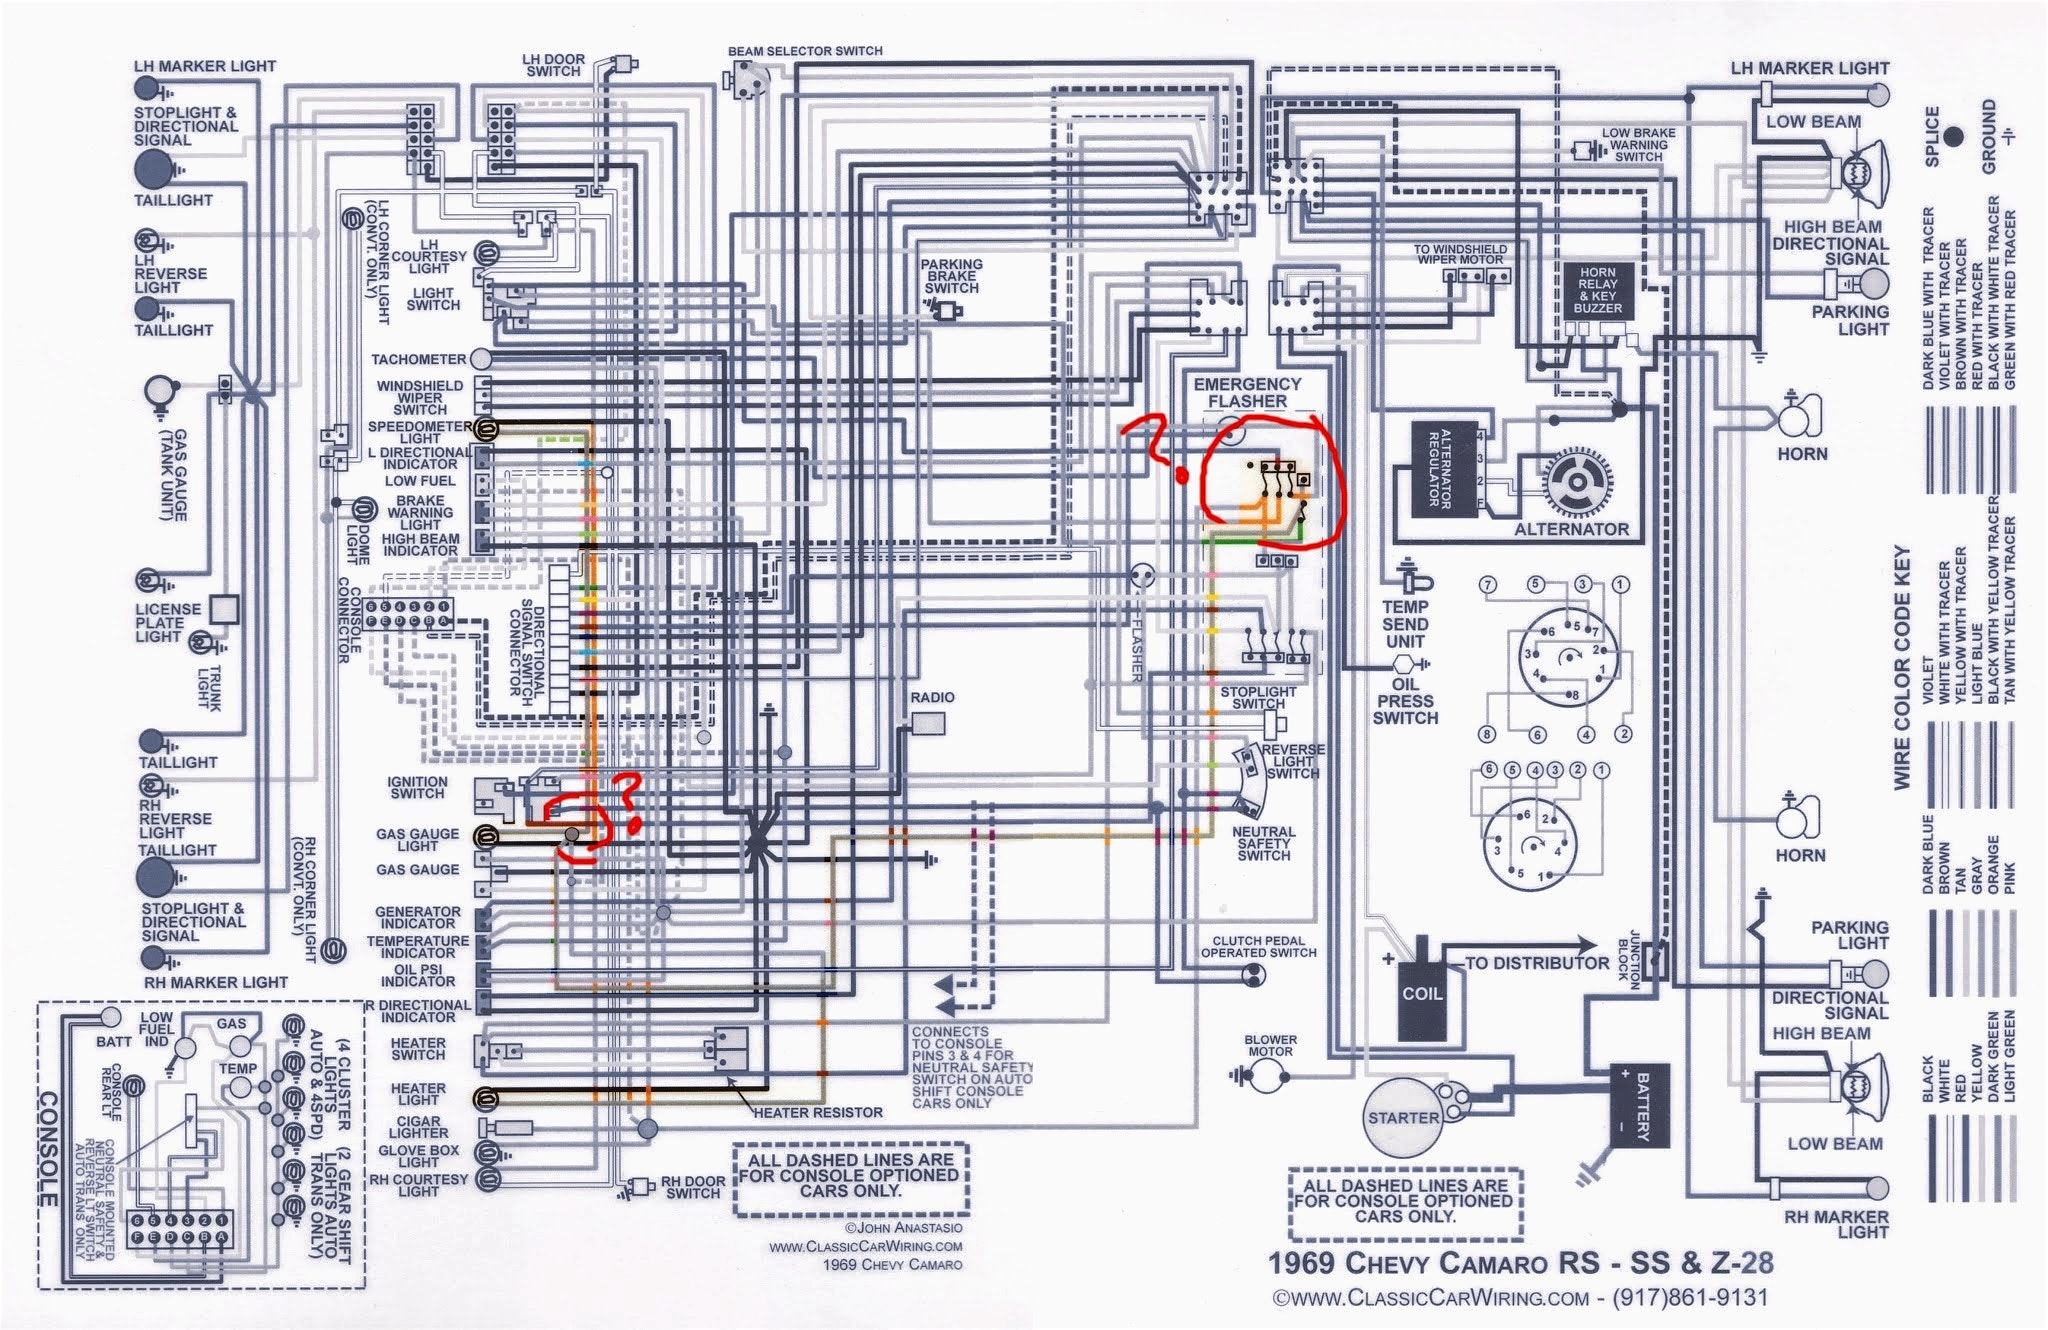 am_3875] fan relay wiring diagram http wwwhondaforemancom 130foreman500  epete inama mohammedshrine librar wiring 101